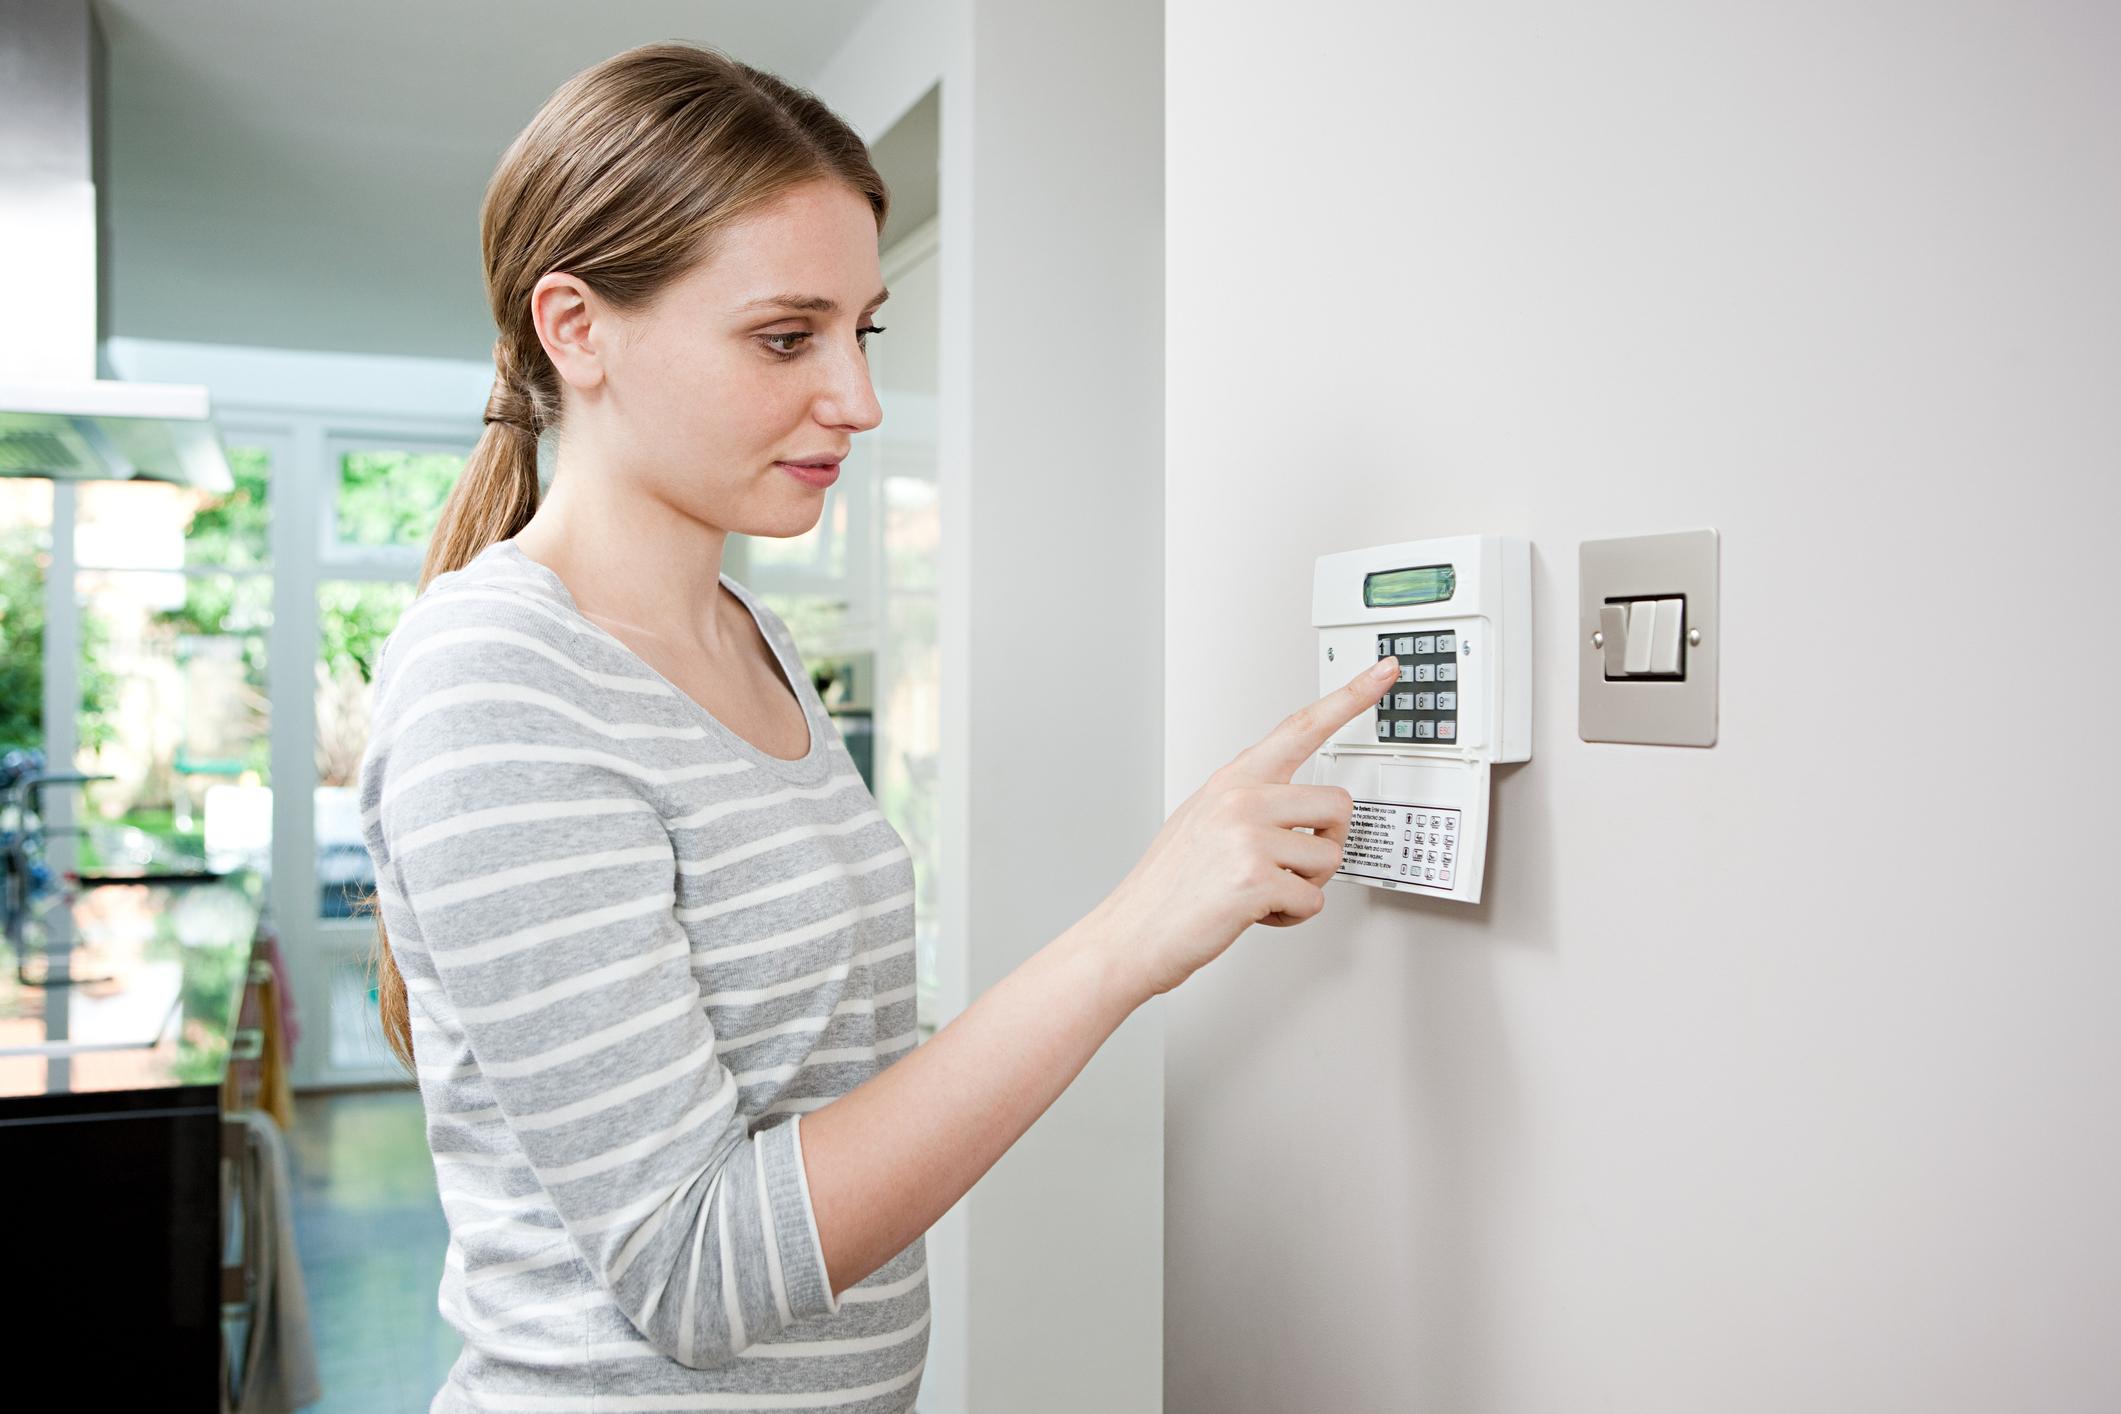 A woman setting a security alarm.